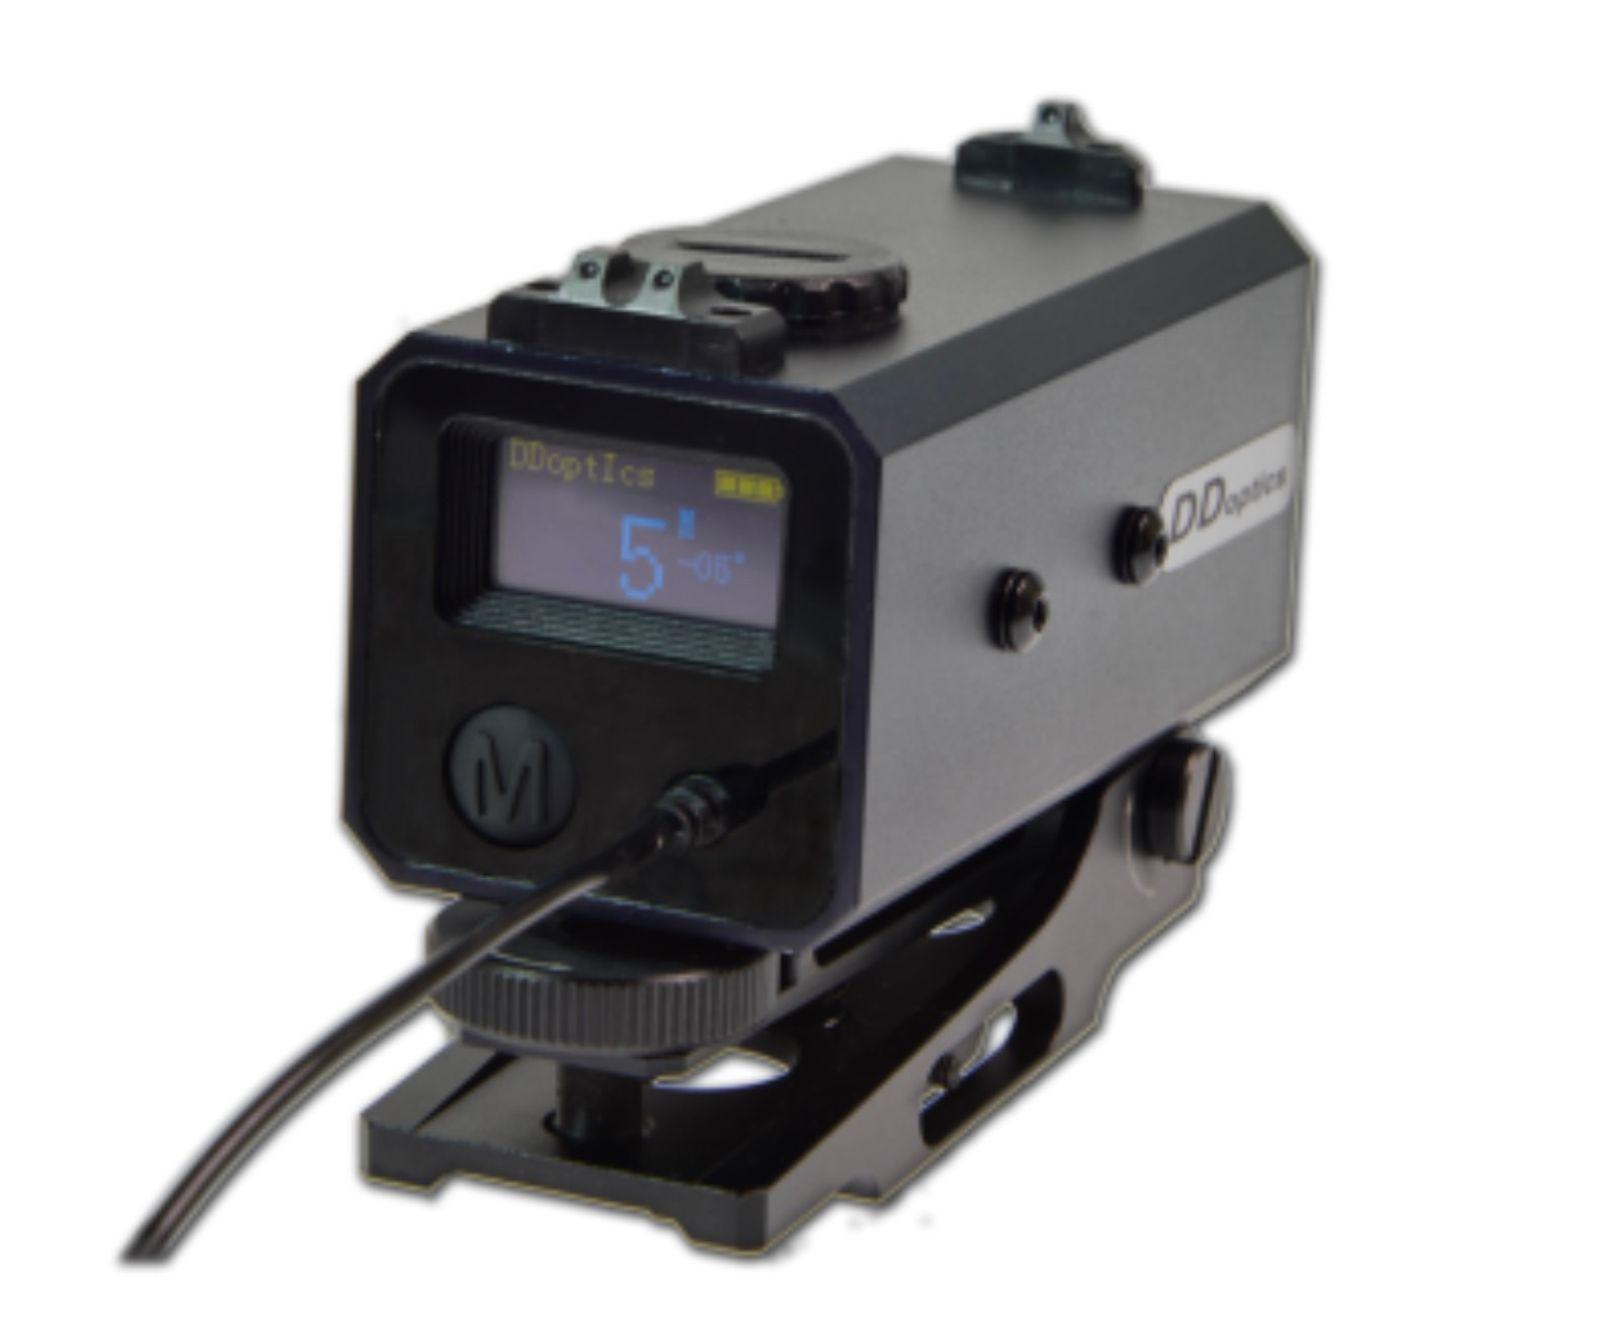 Gps Entfernungsmesser Jagd : Ddoptics rf800 pro rangefinder